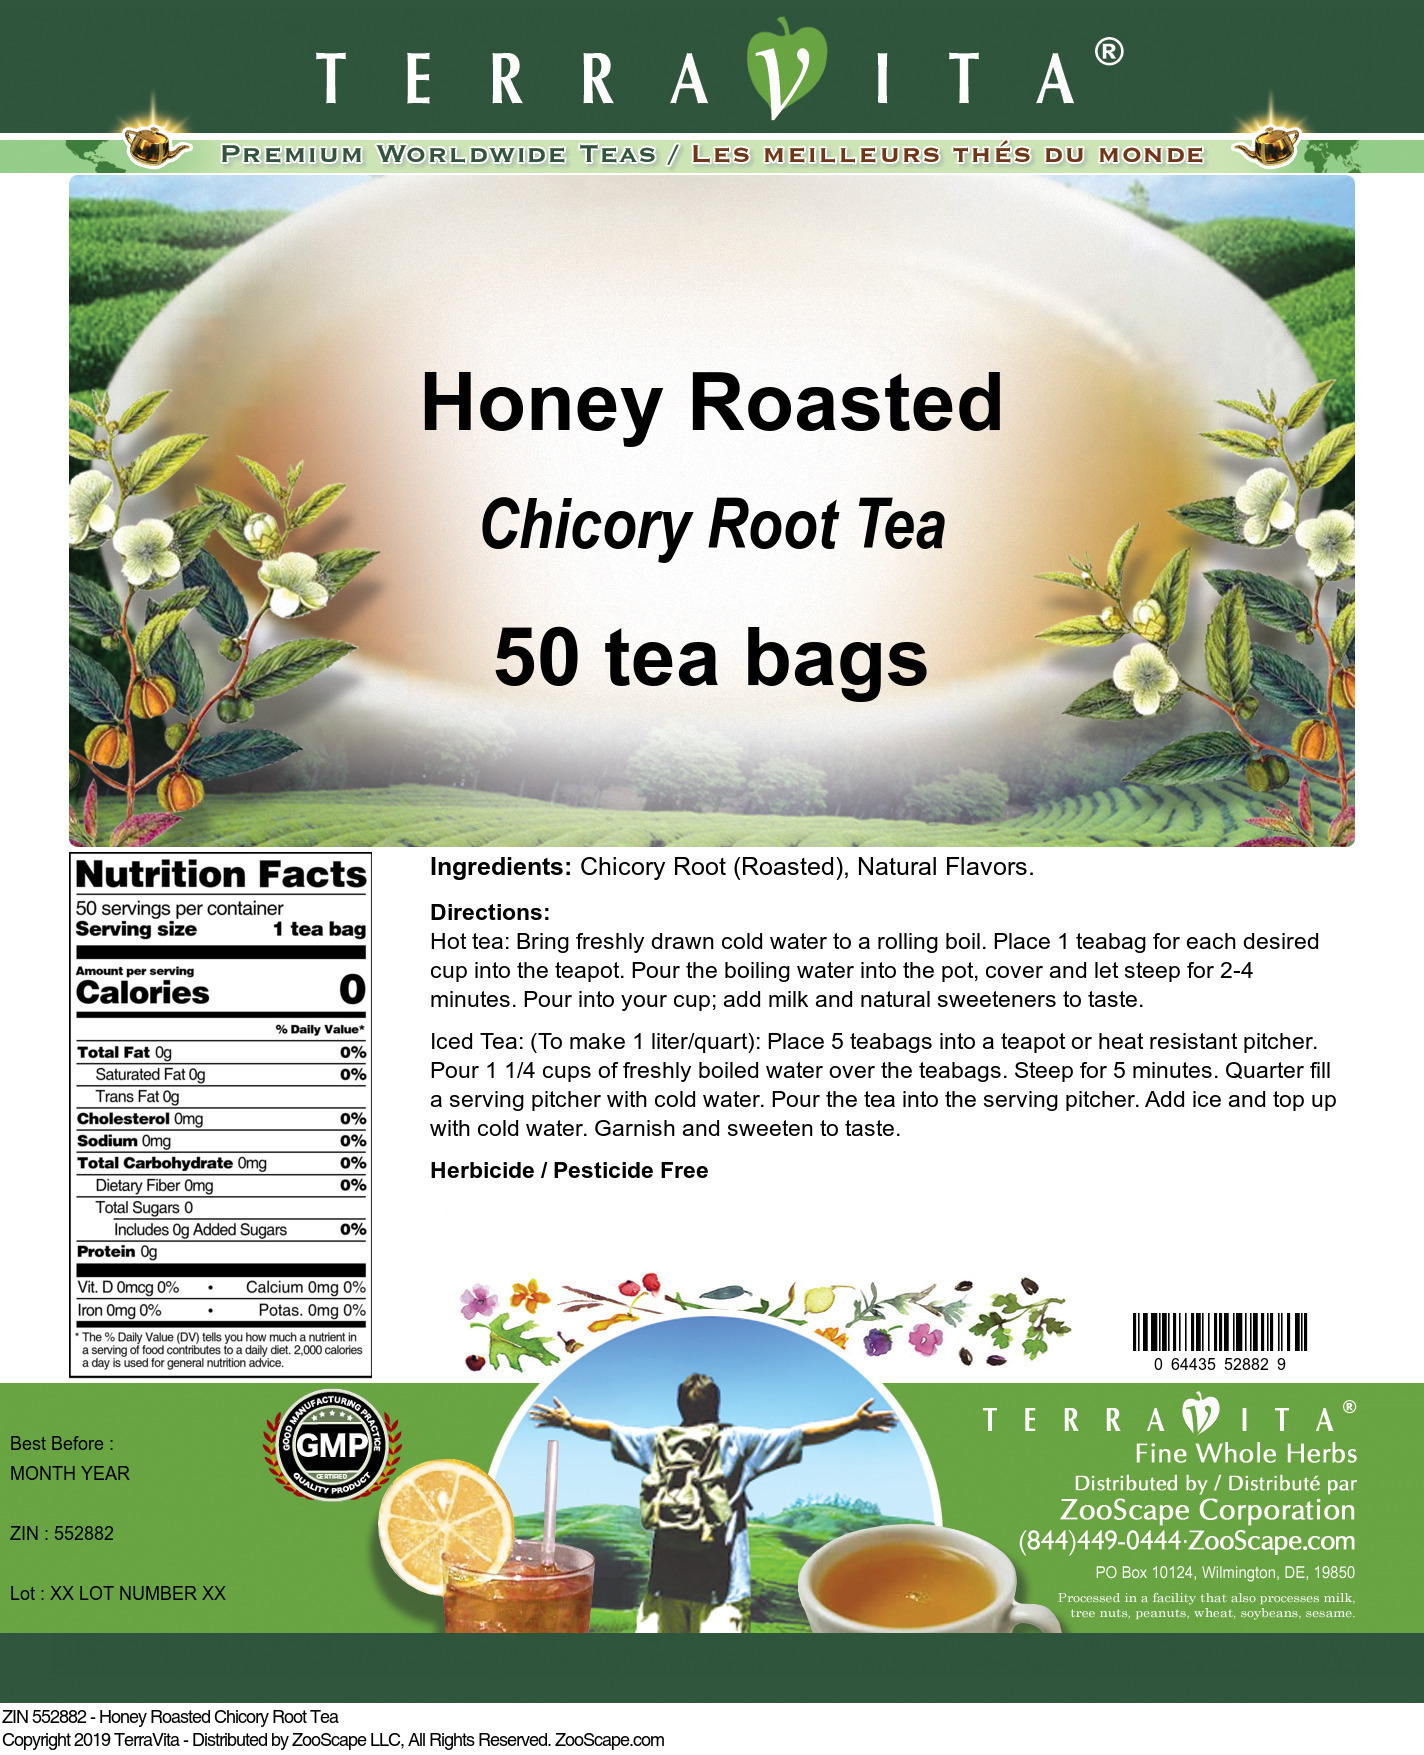 Honey Roasted Chicory Root Tea